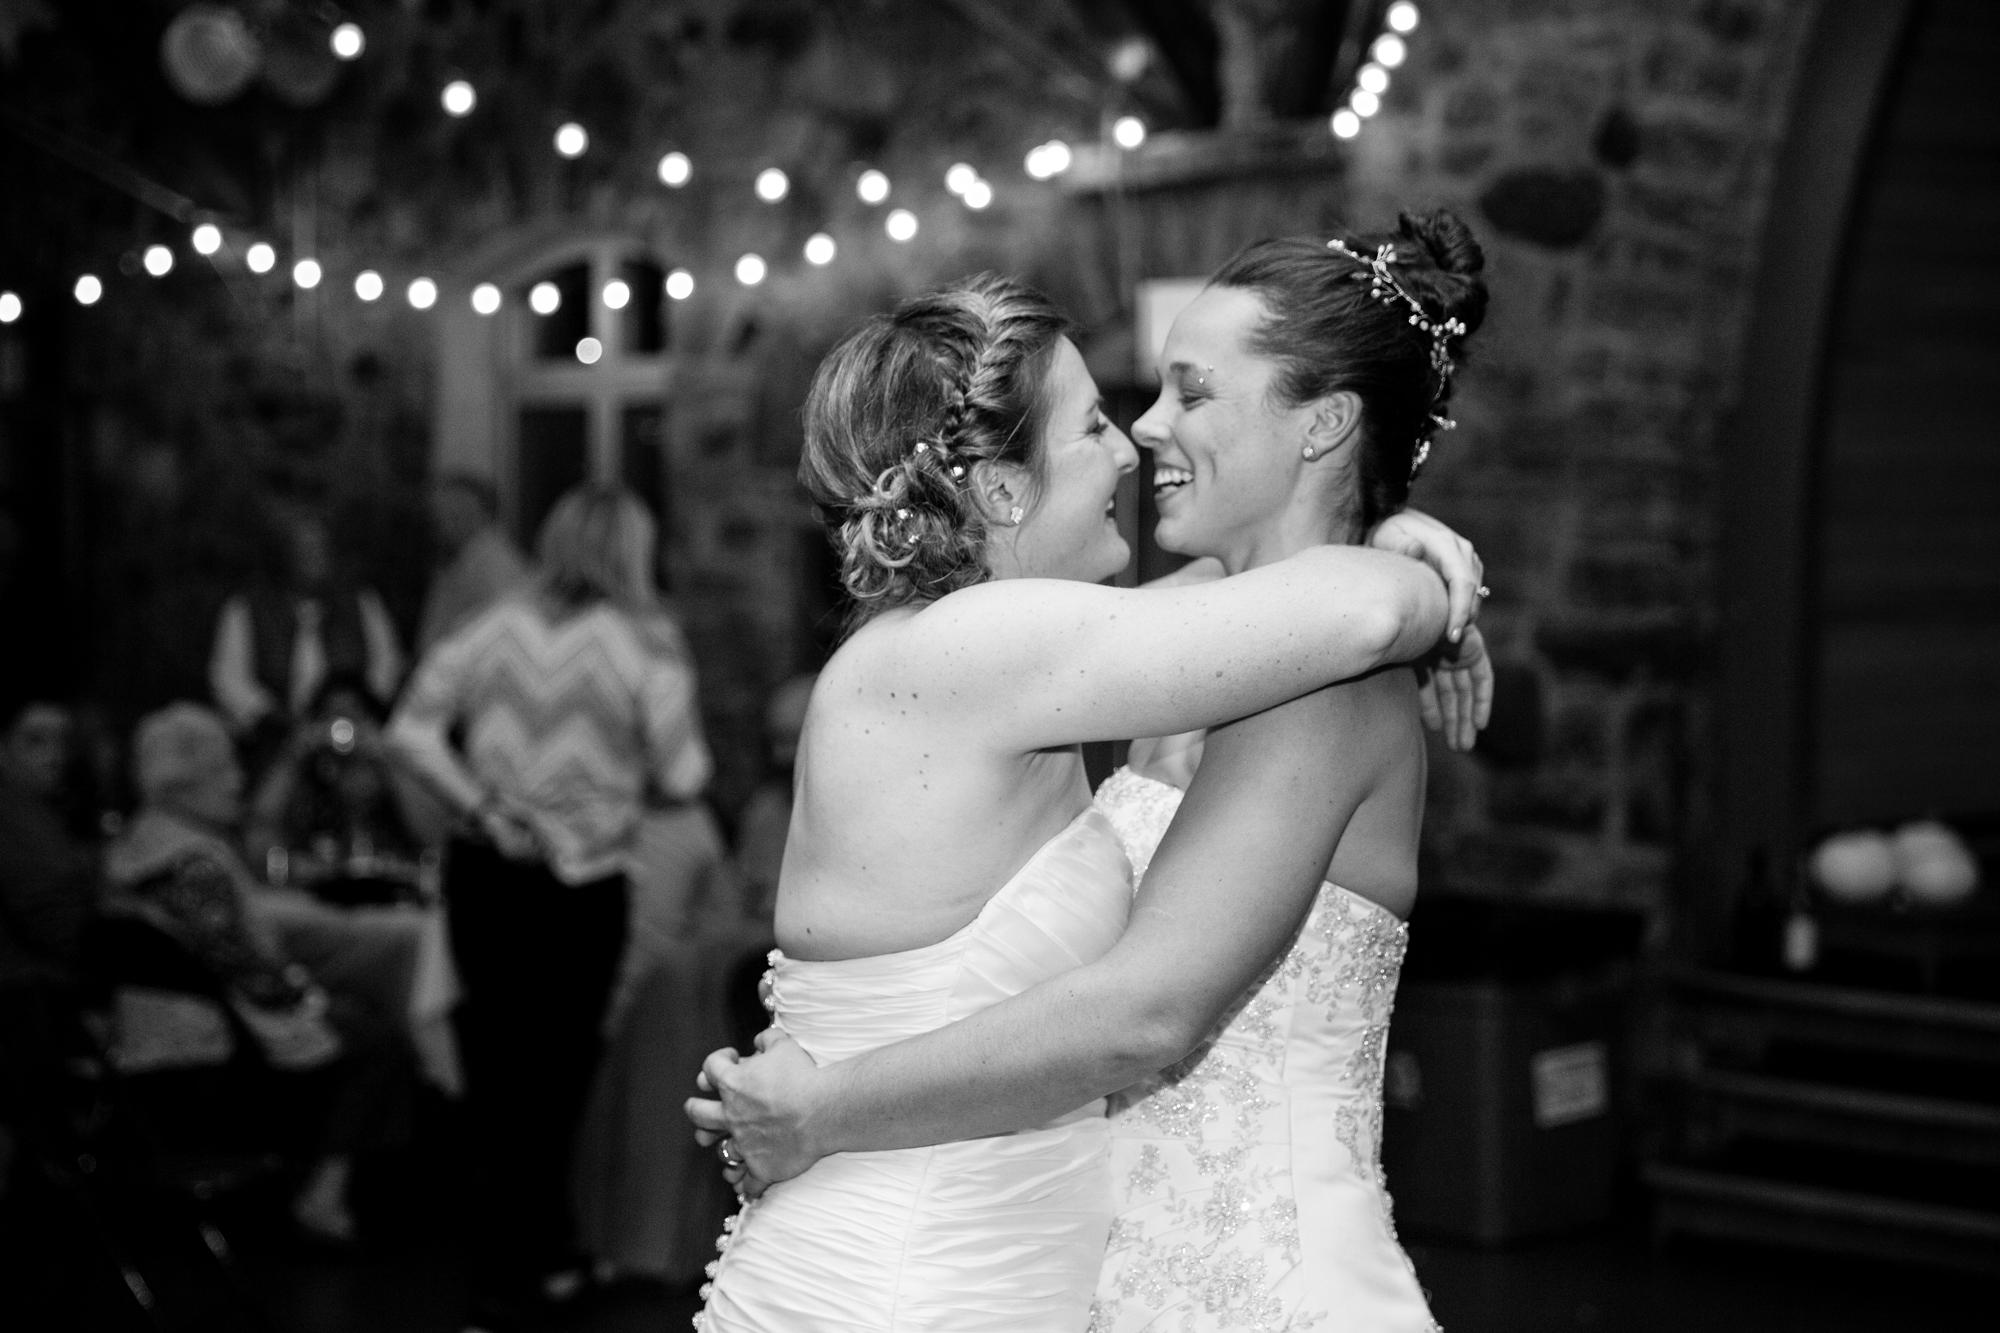 Pamperin Park Wedding Green Bay Wisconsin Same Sex Wedding - Whit Meza Photography